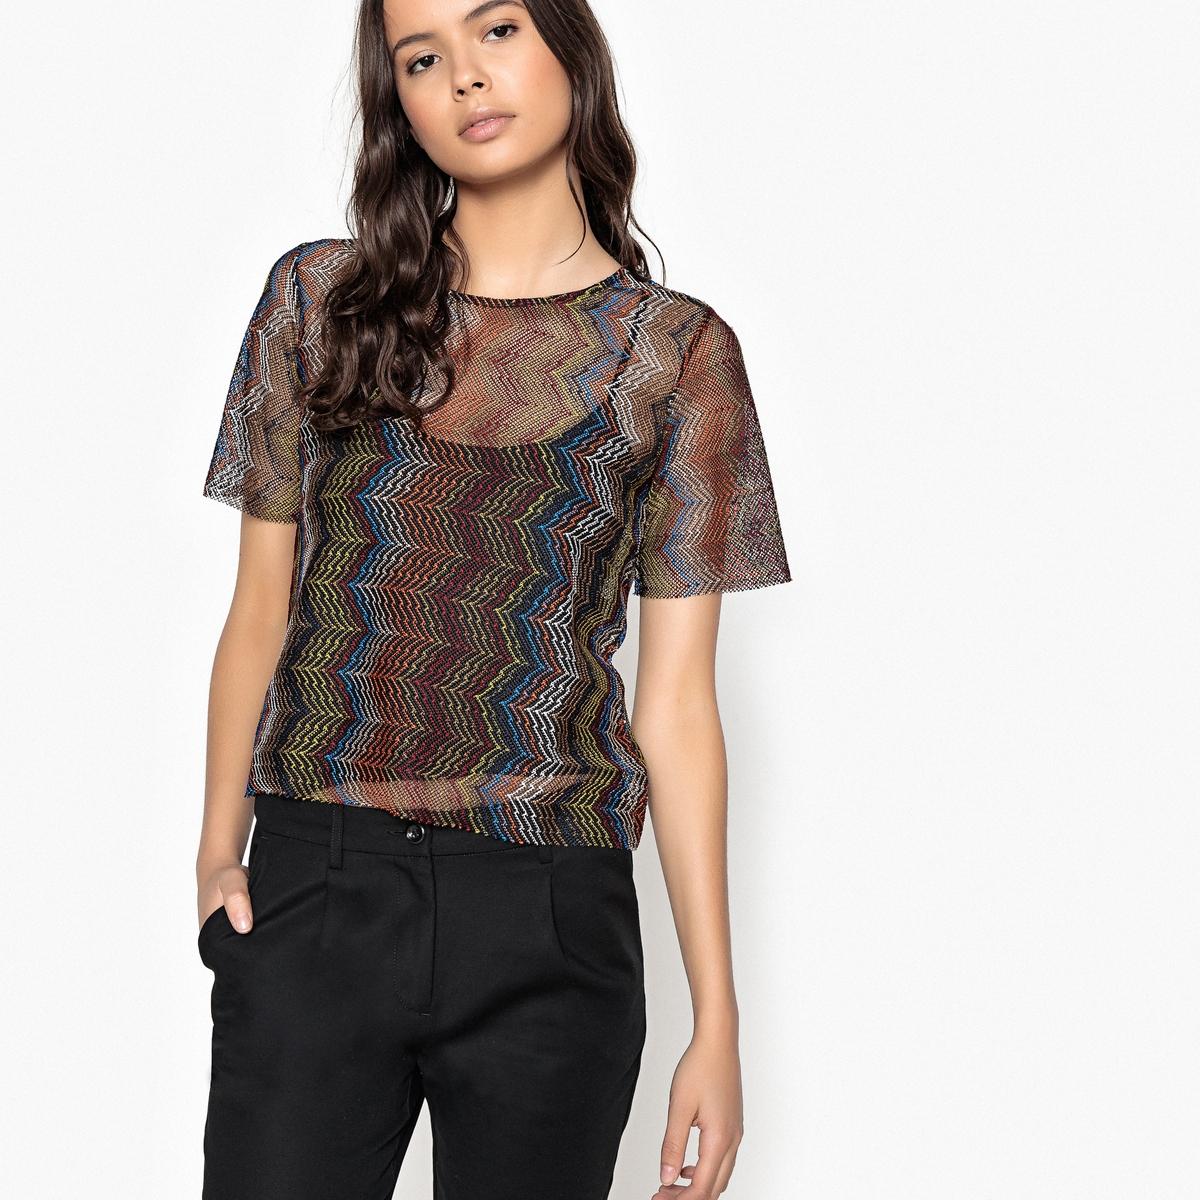 T-shirt fina, gola redonda, mangas curtas, estampada